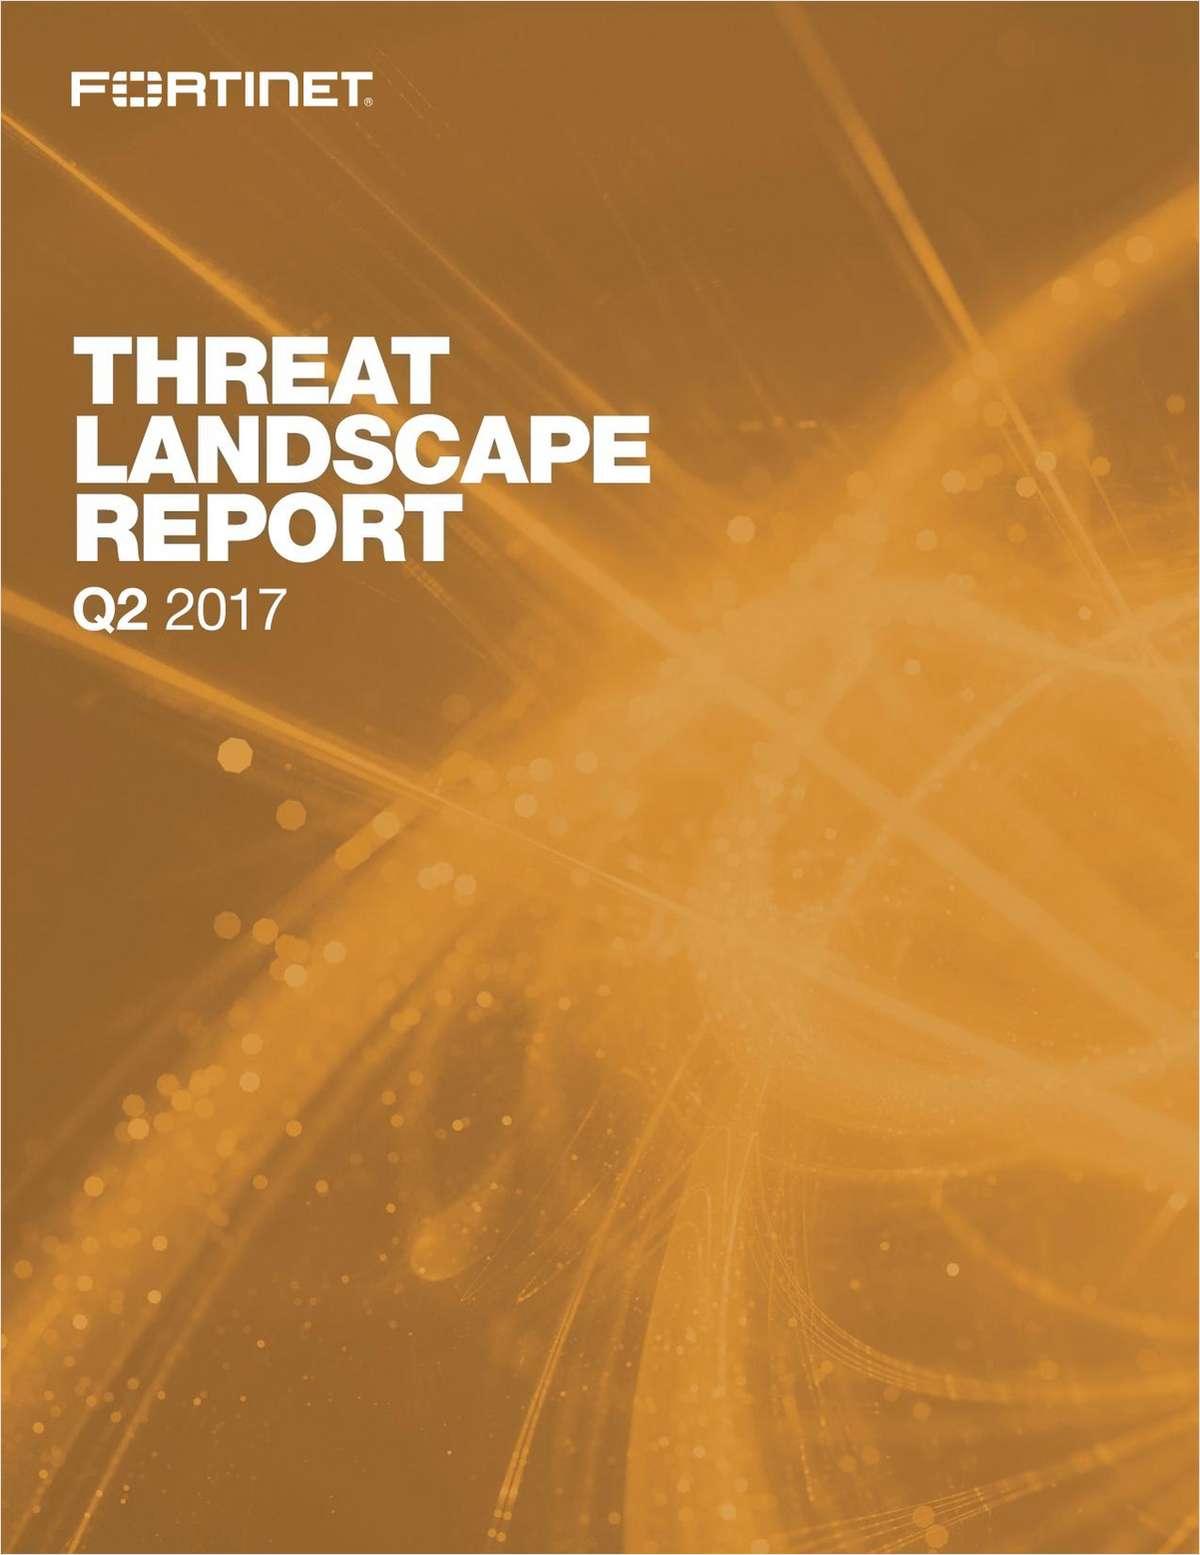 Fortinet Threat Landscape Q2 2017